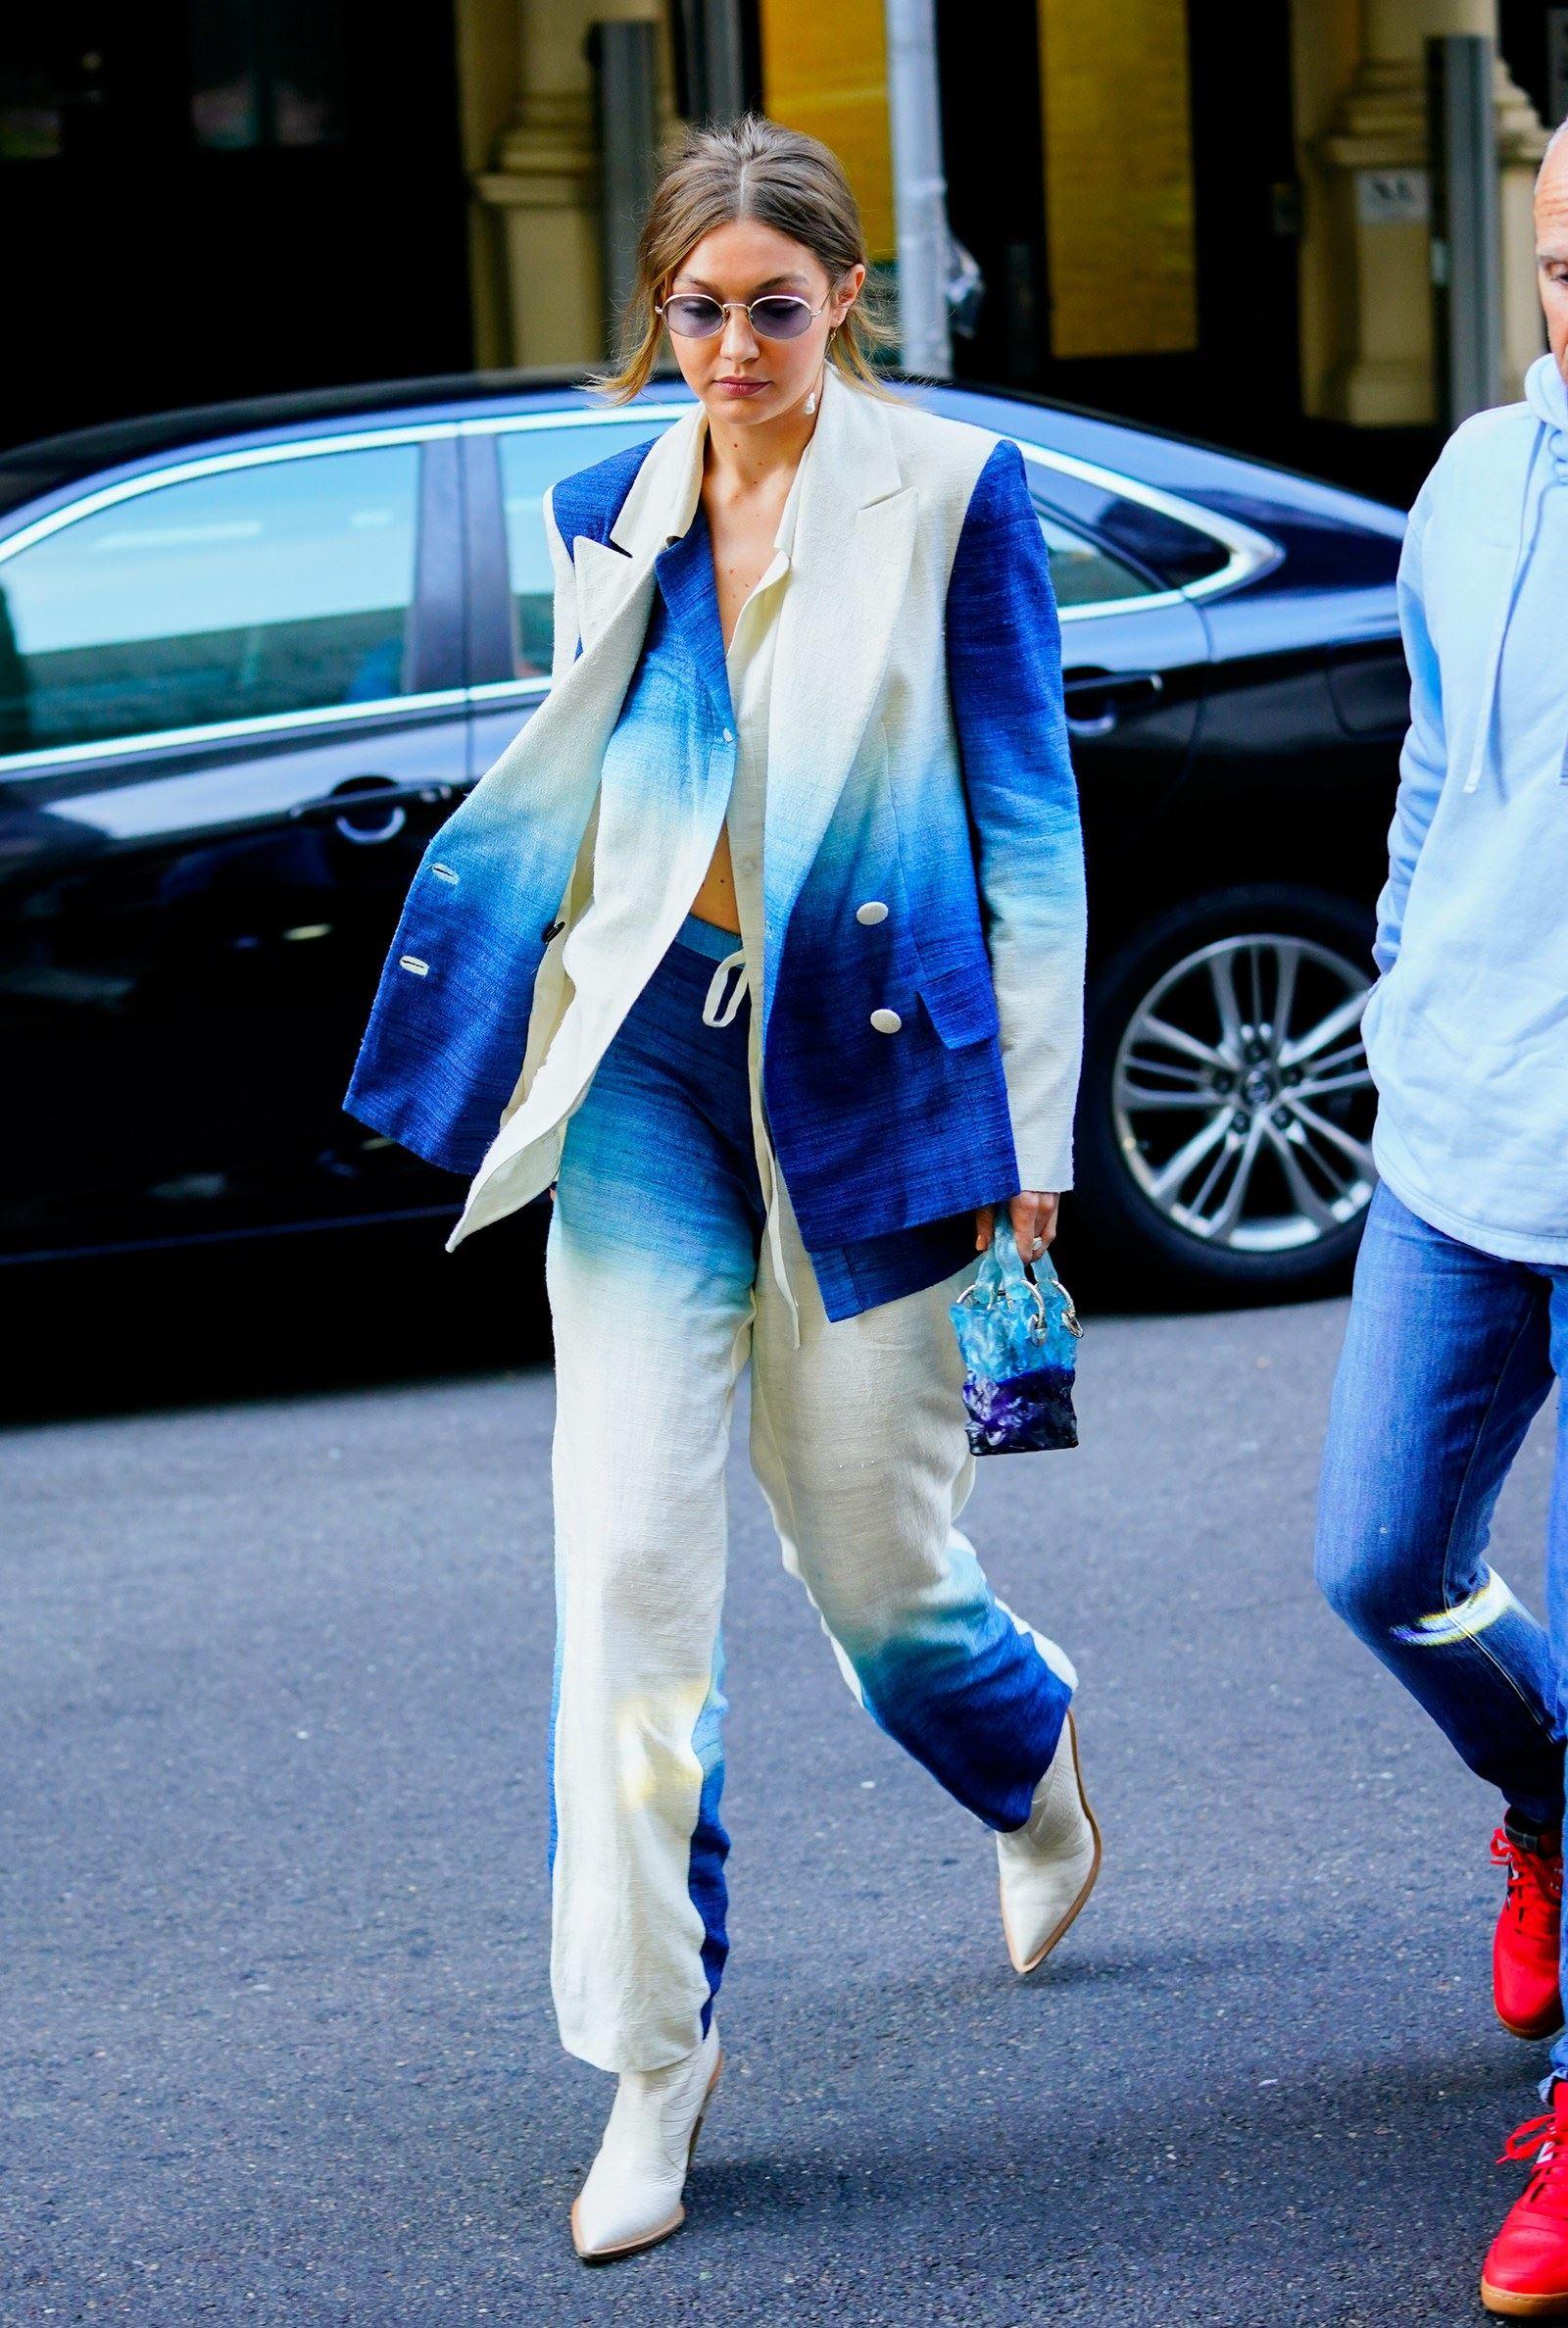 gigi hadid pun pakai suit dengan corak tie-dye! serious cantik dan awesome